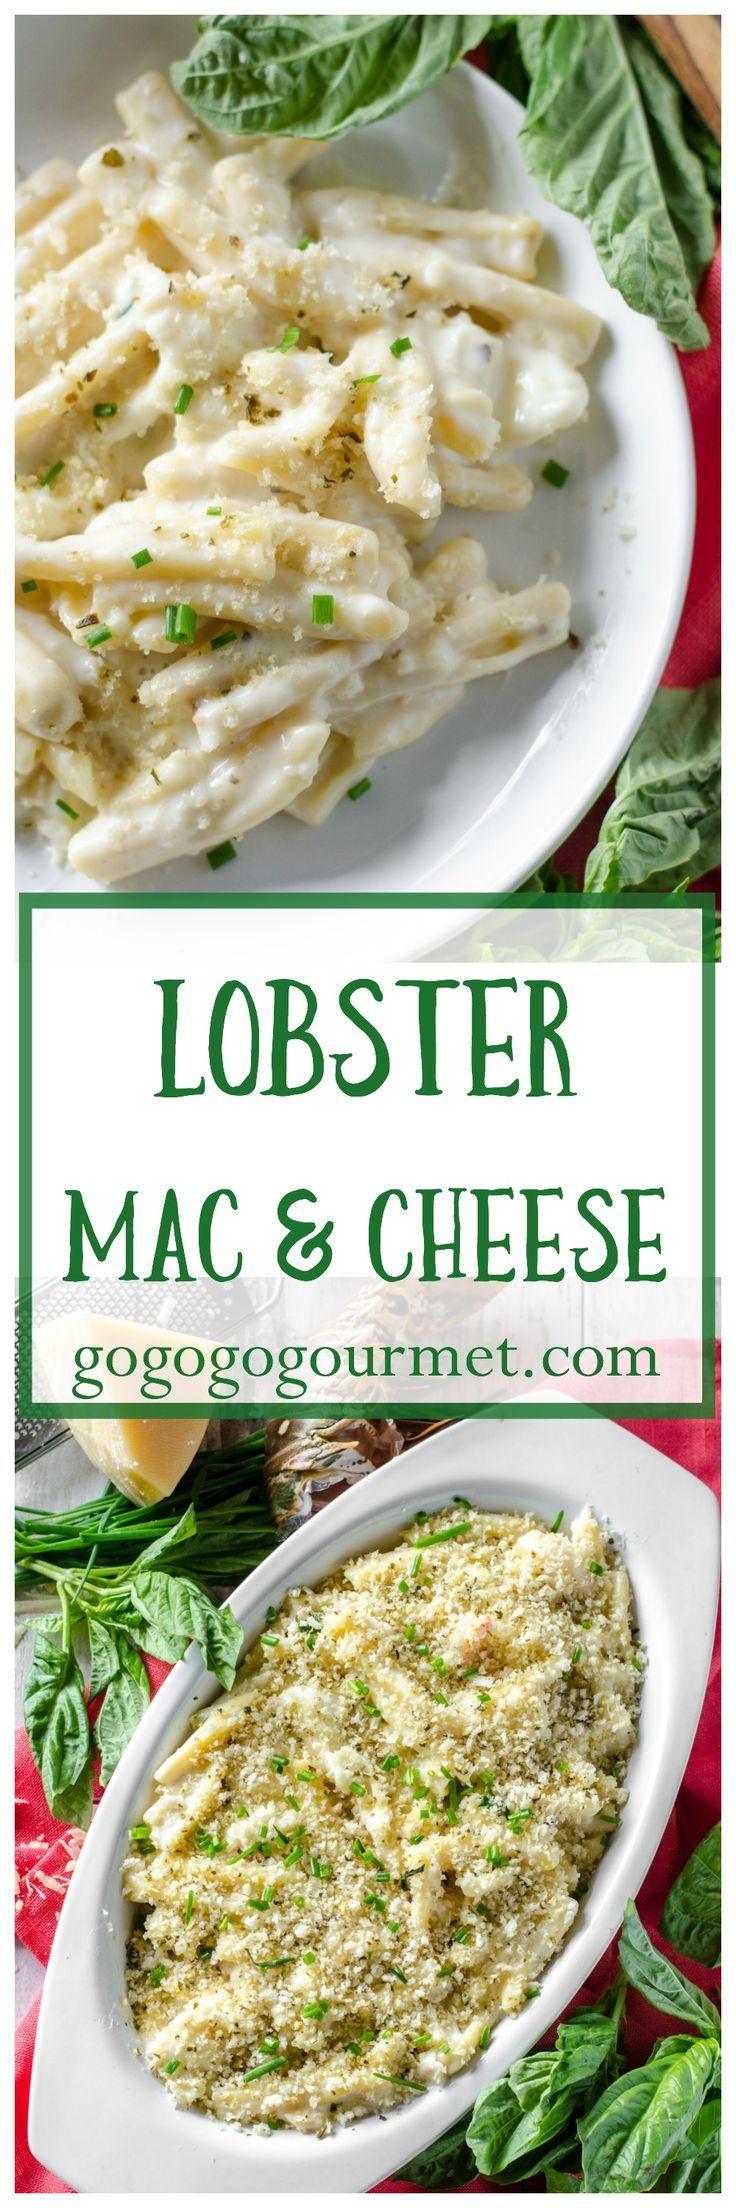 Gourmet pasta side dish recipes